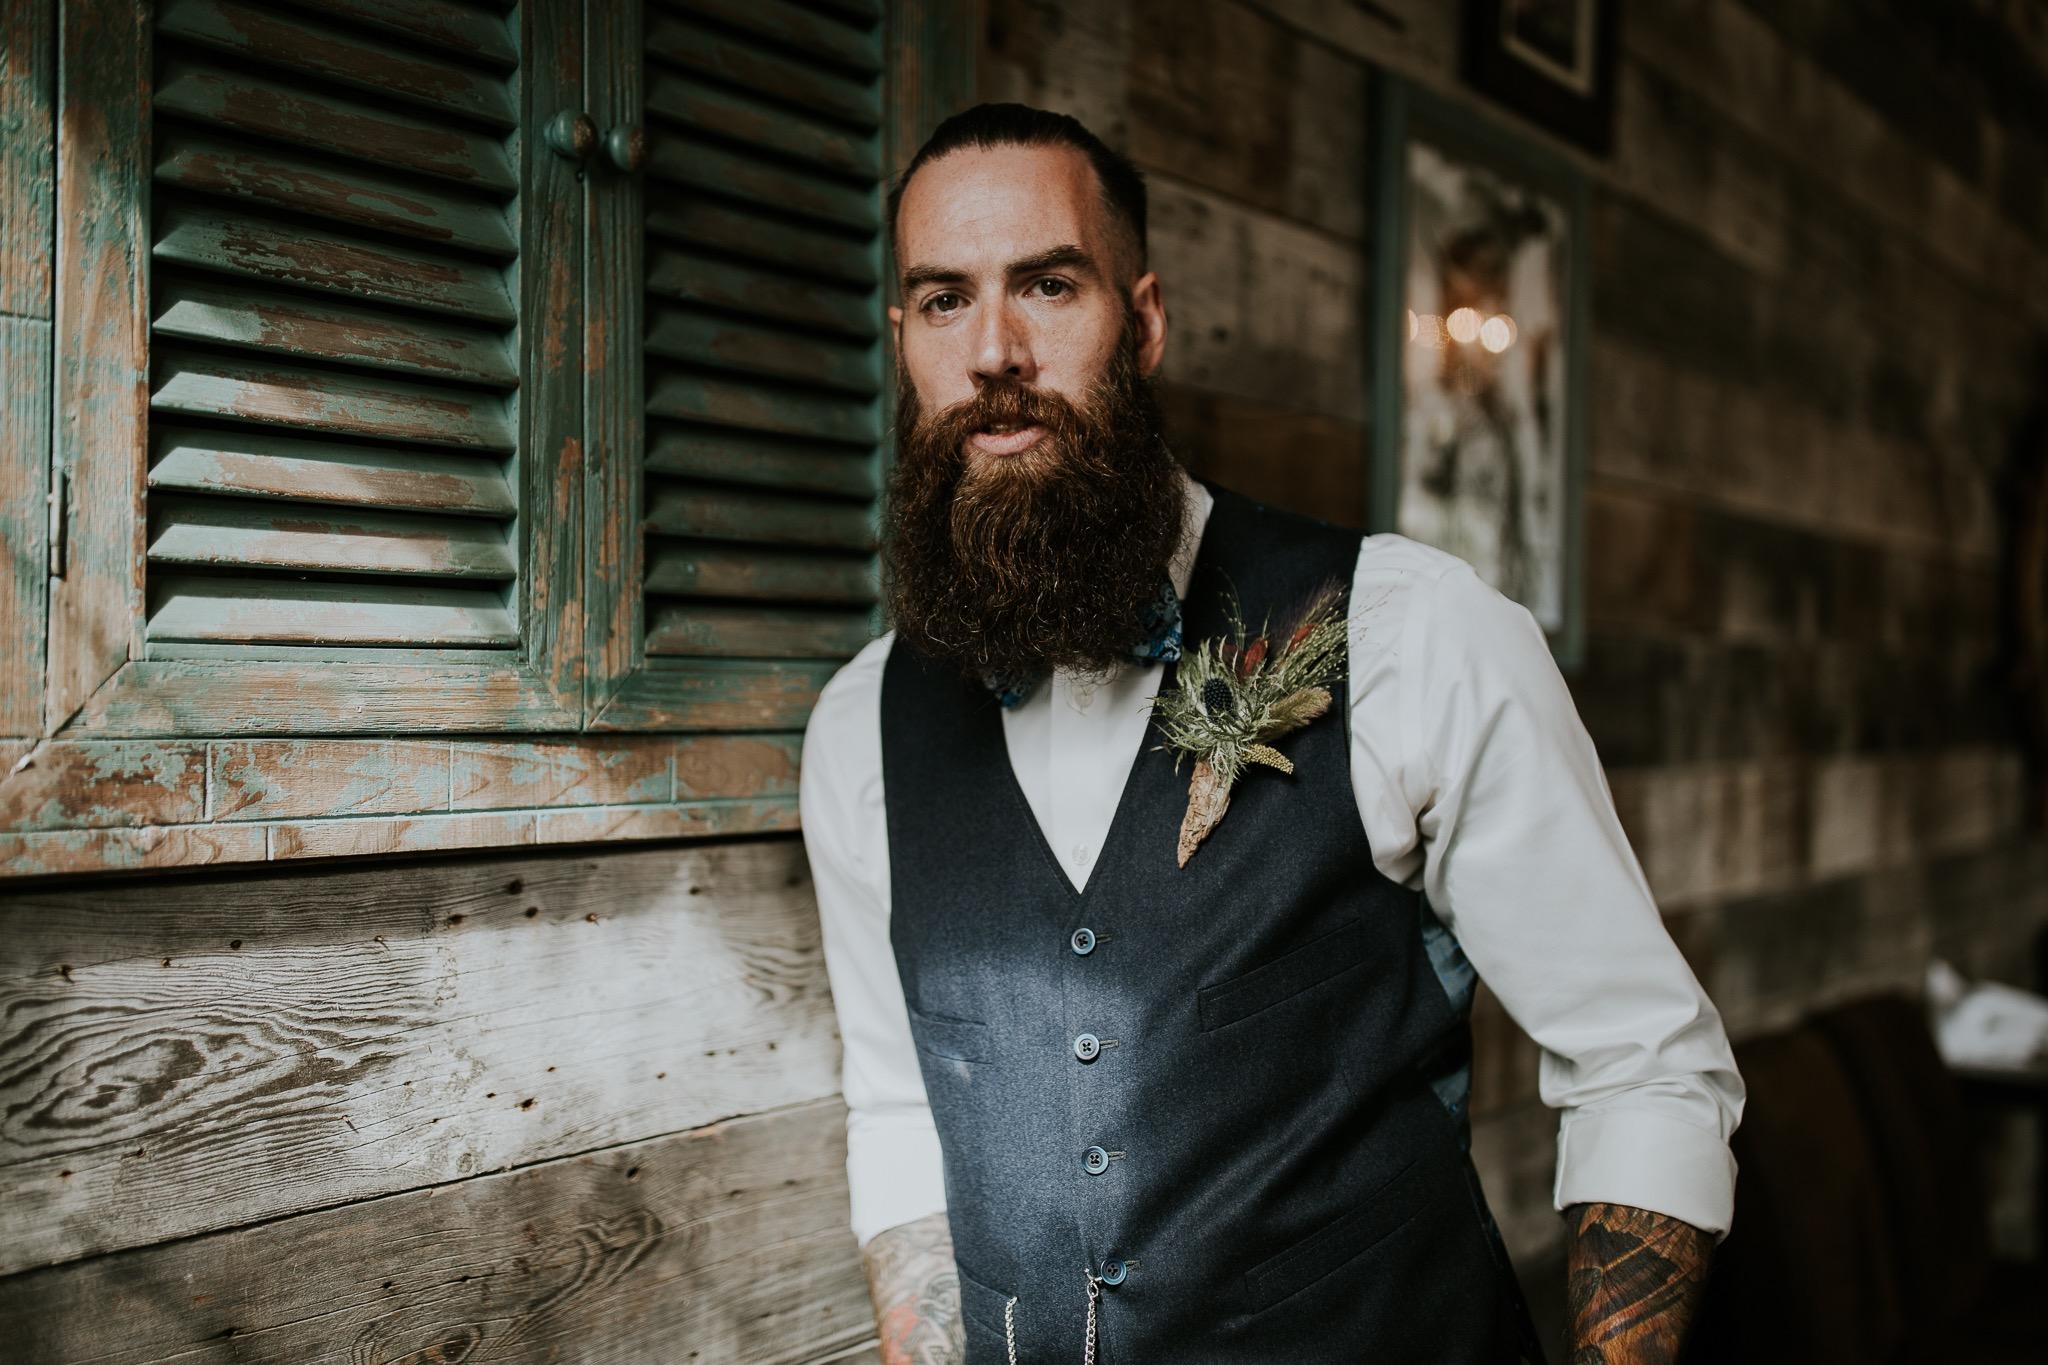 20170915-canmore-moody-wedding-photographer-creekside-creeksidestyledshoot-time&fate-4967